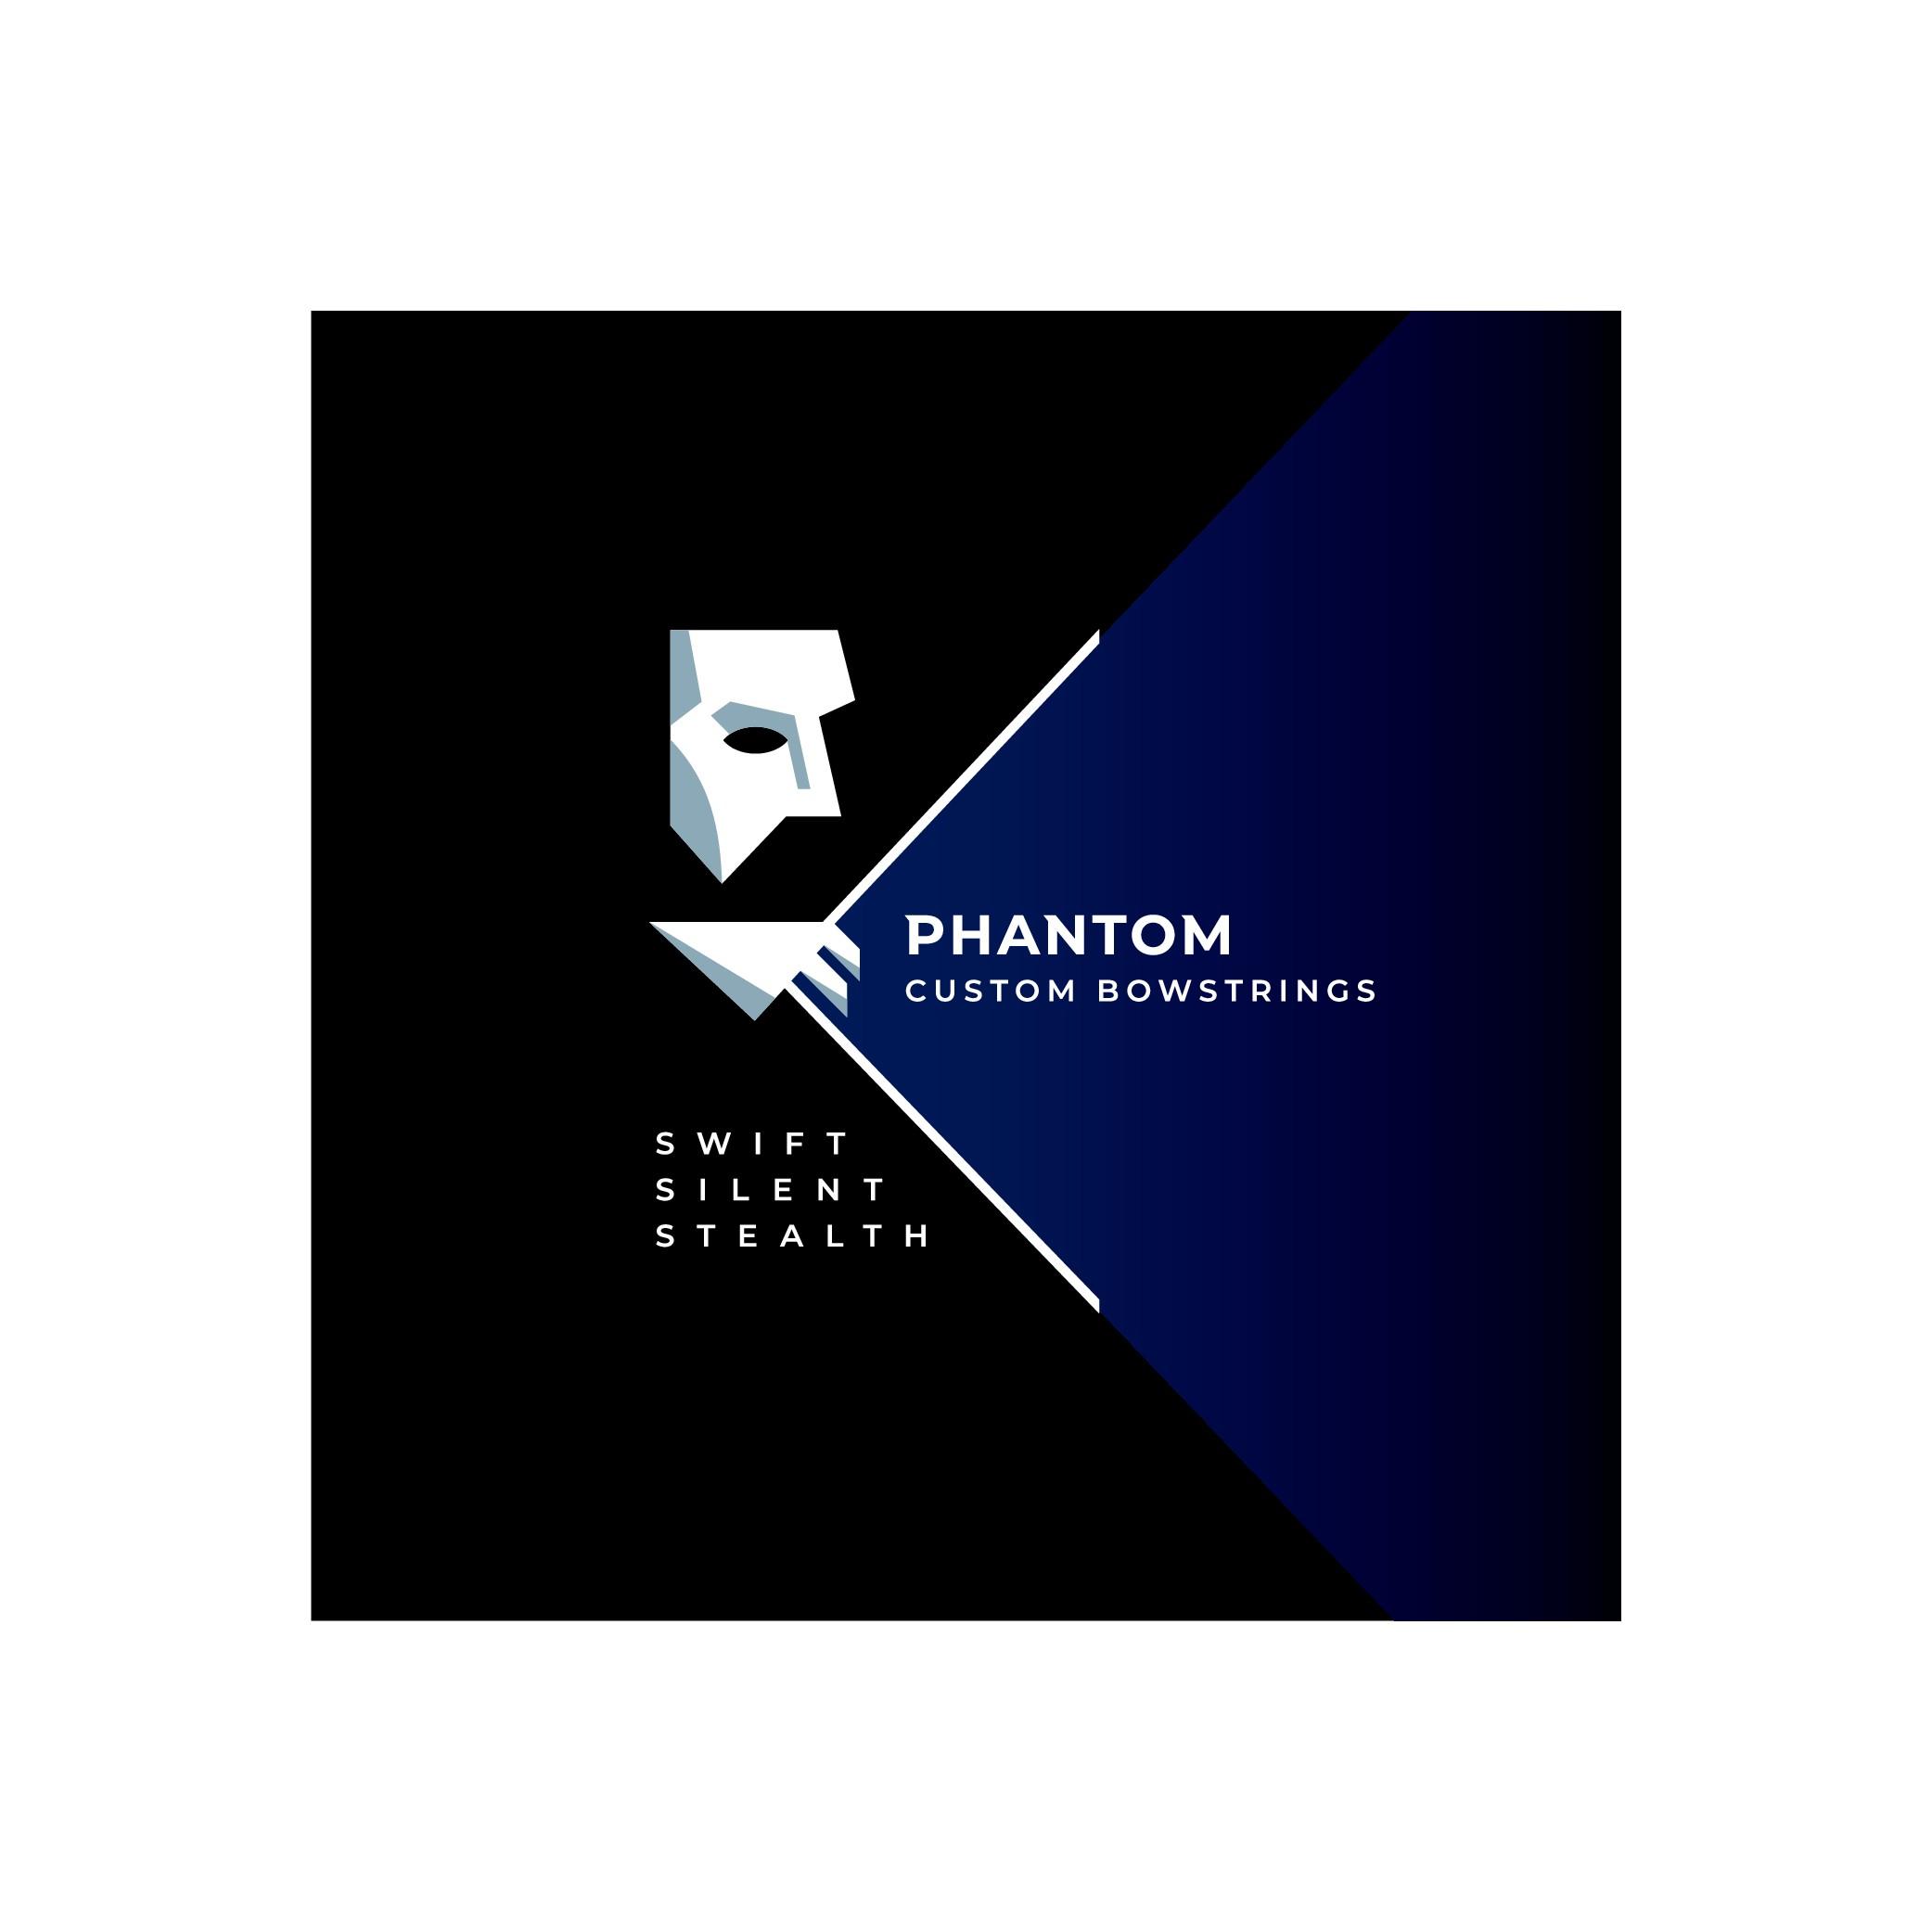 Phantom Custom Bowstrings needs a powerful new logo design